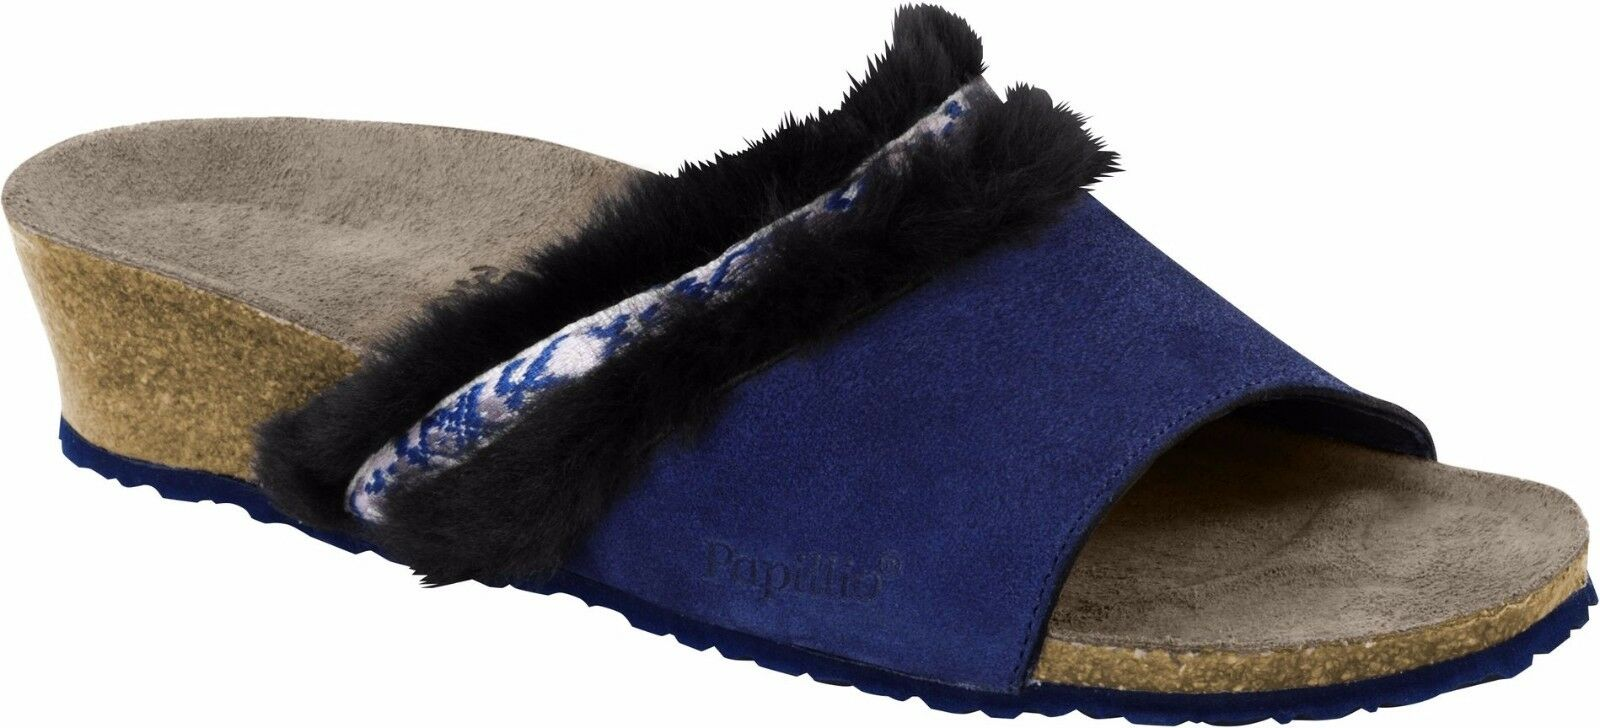 Papillio Amber Cozy Night Fußbett Blue Veloursleder/Fell Größe 38 Fußbett Night schmal 5ab960